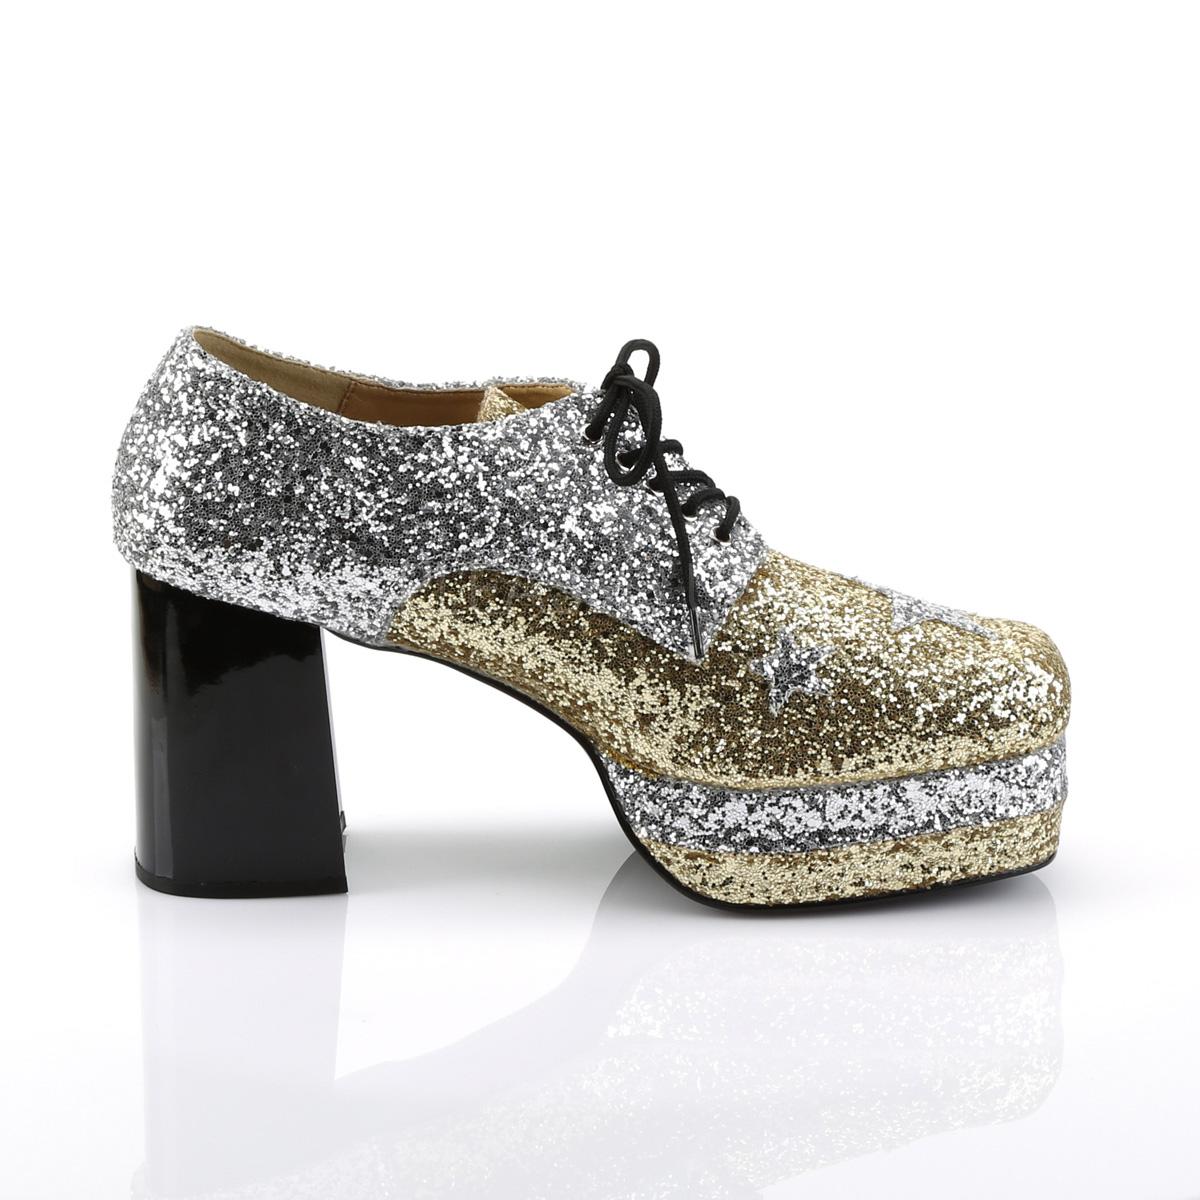 Funtasma GLAMROCK-02 3 1/2inch Heel, 1 1/2inch Stacked PF, Lace Up Black Glitter Oxford #Men's ◆取り寄せ